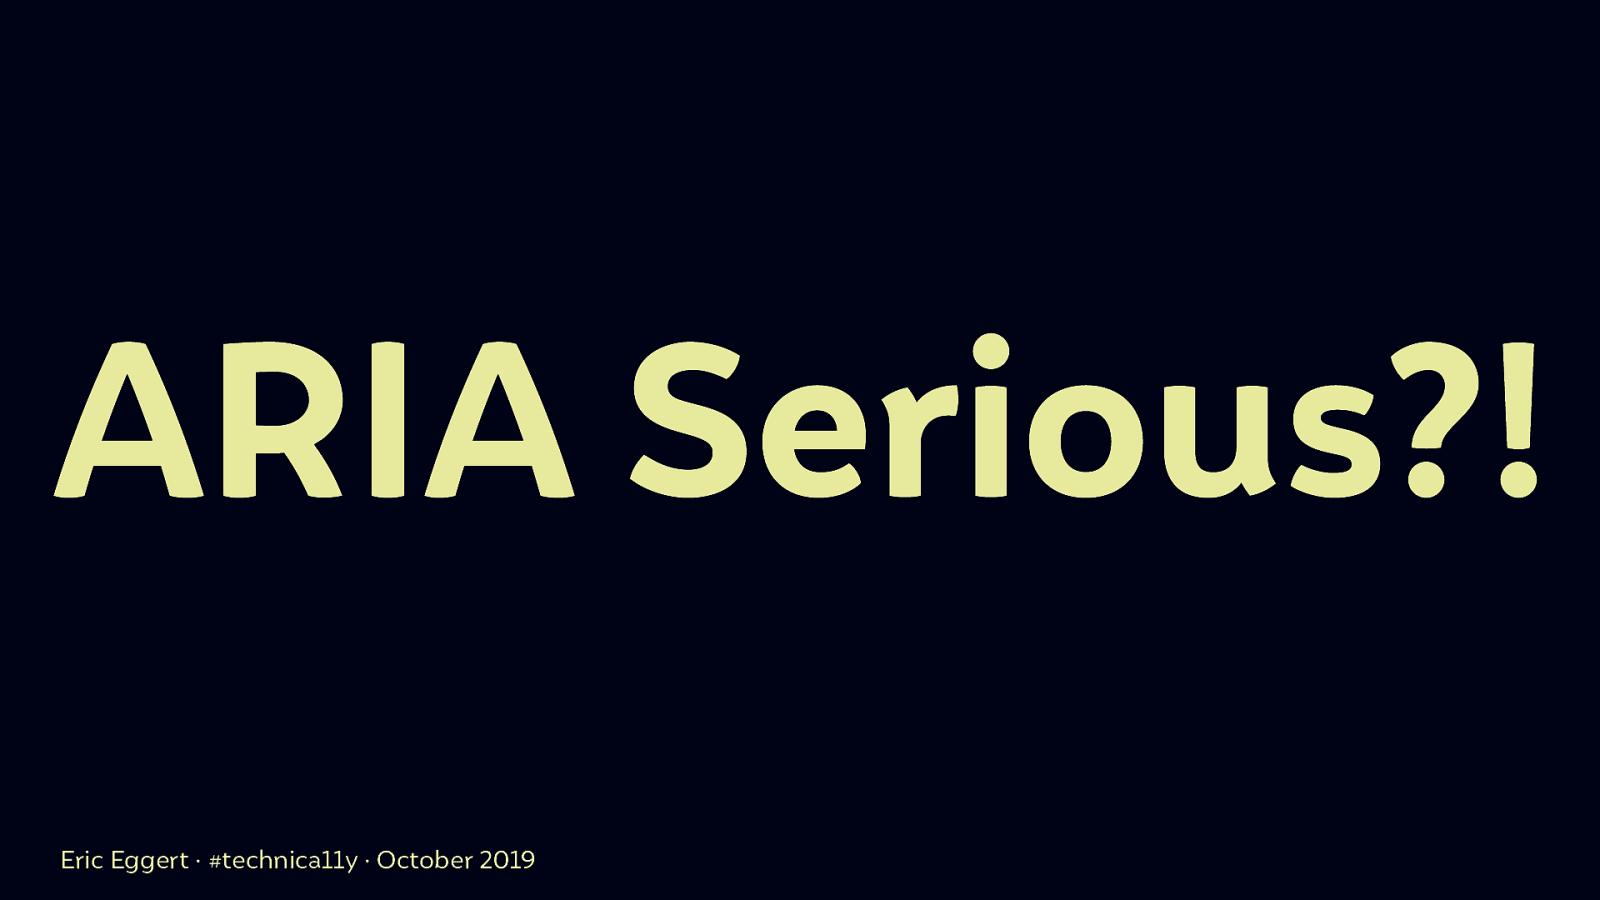 ARIA Serious?!